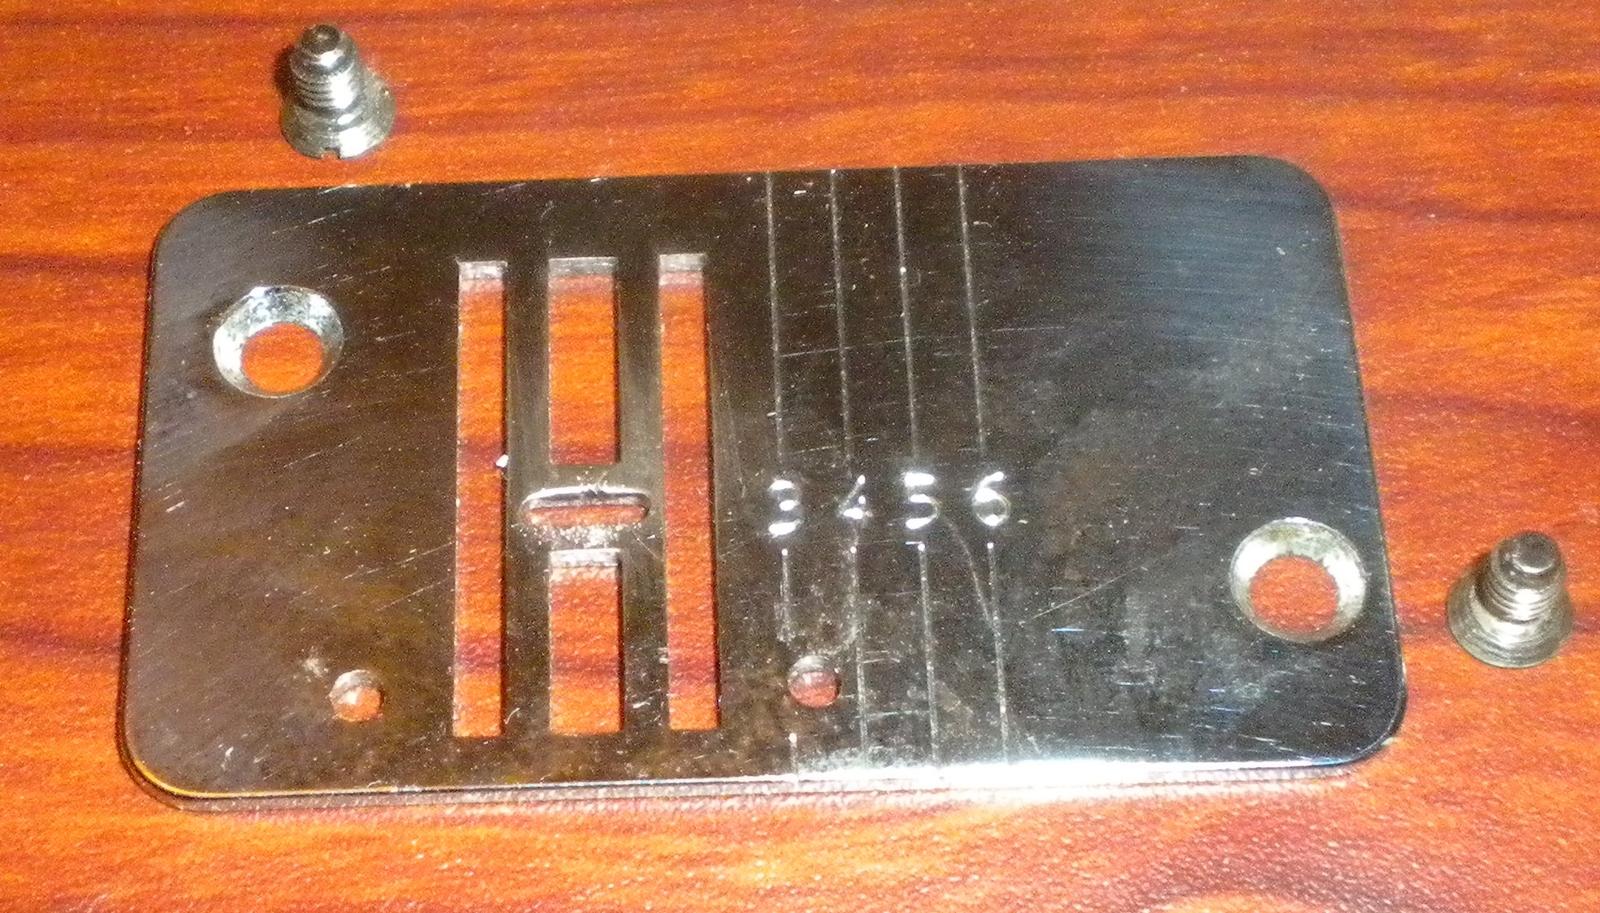 Viking Husqvarna 6030 Free Arm Throat (Needle) Plate Zig Zag w/Screws - $15.00